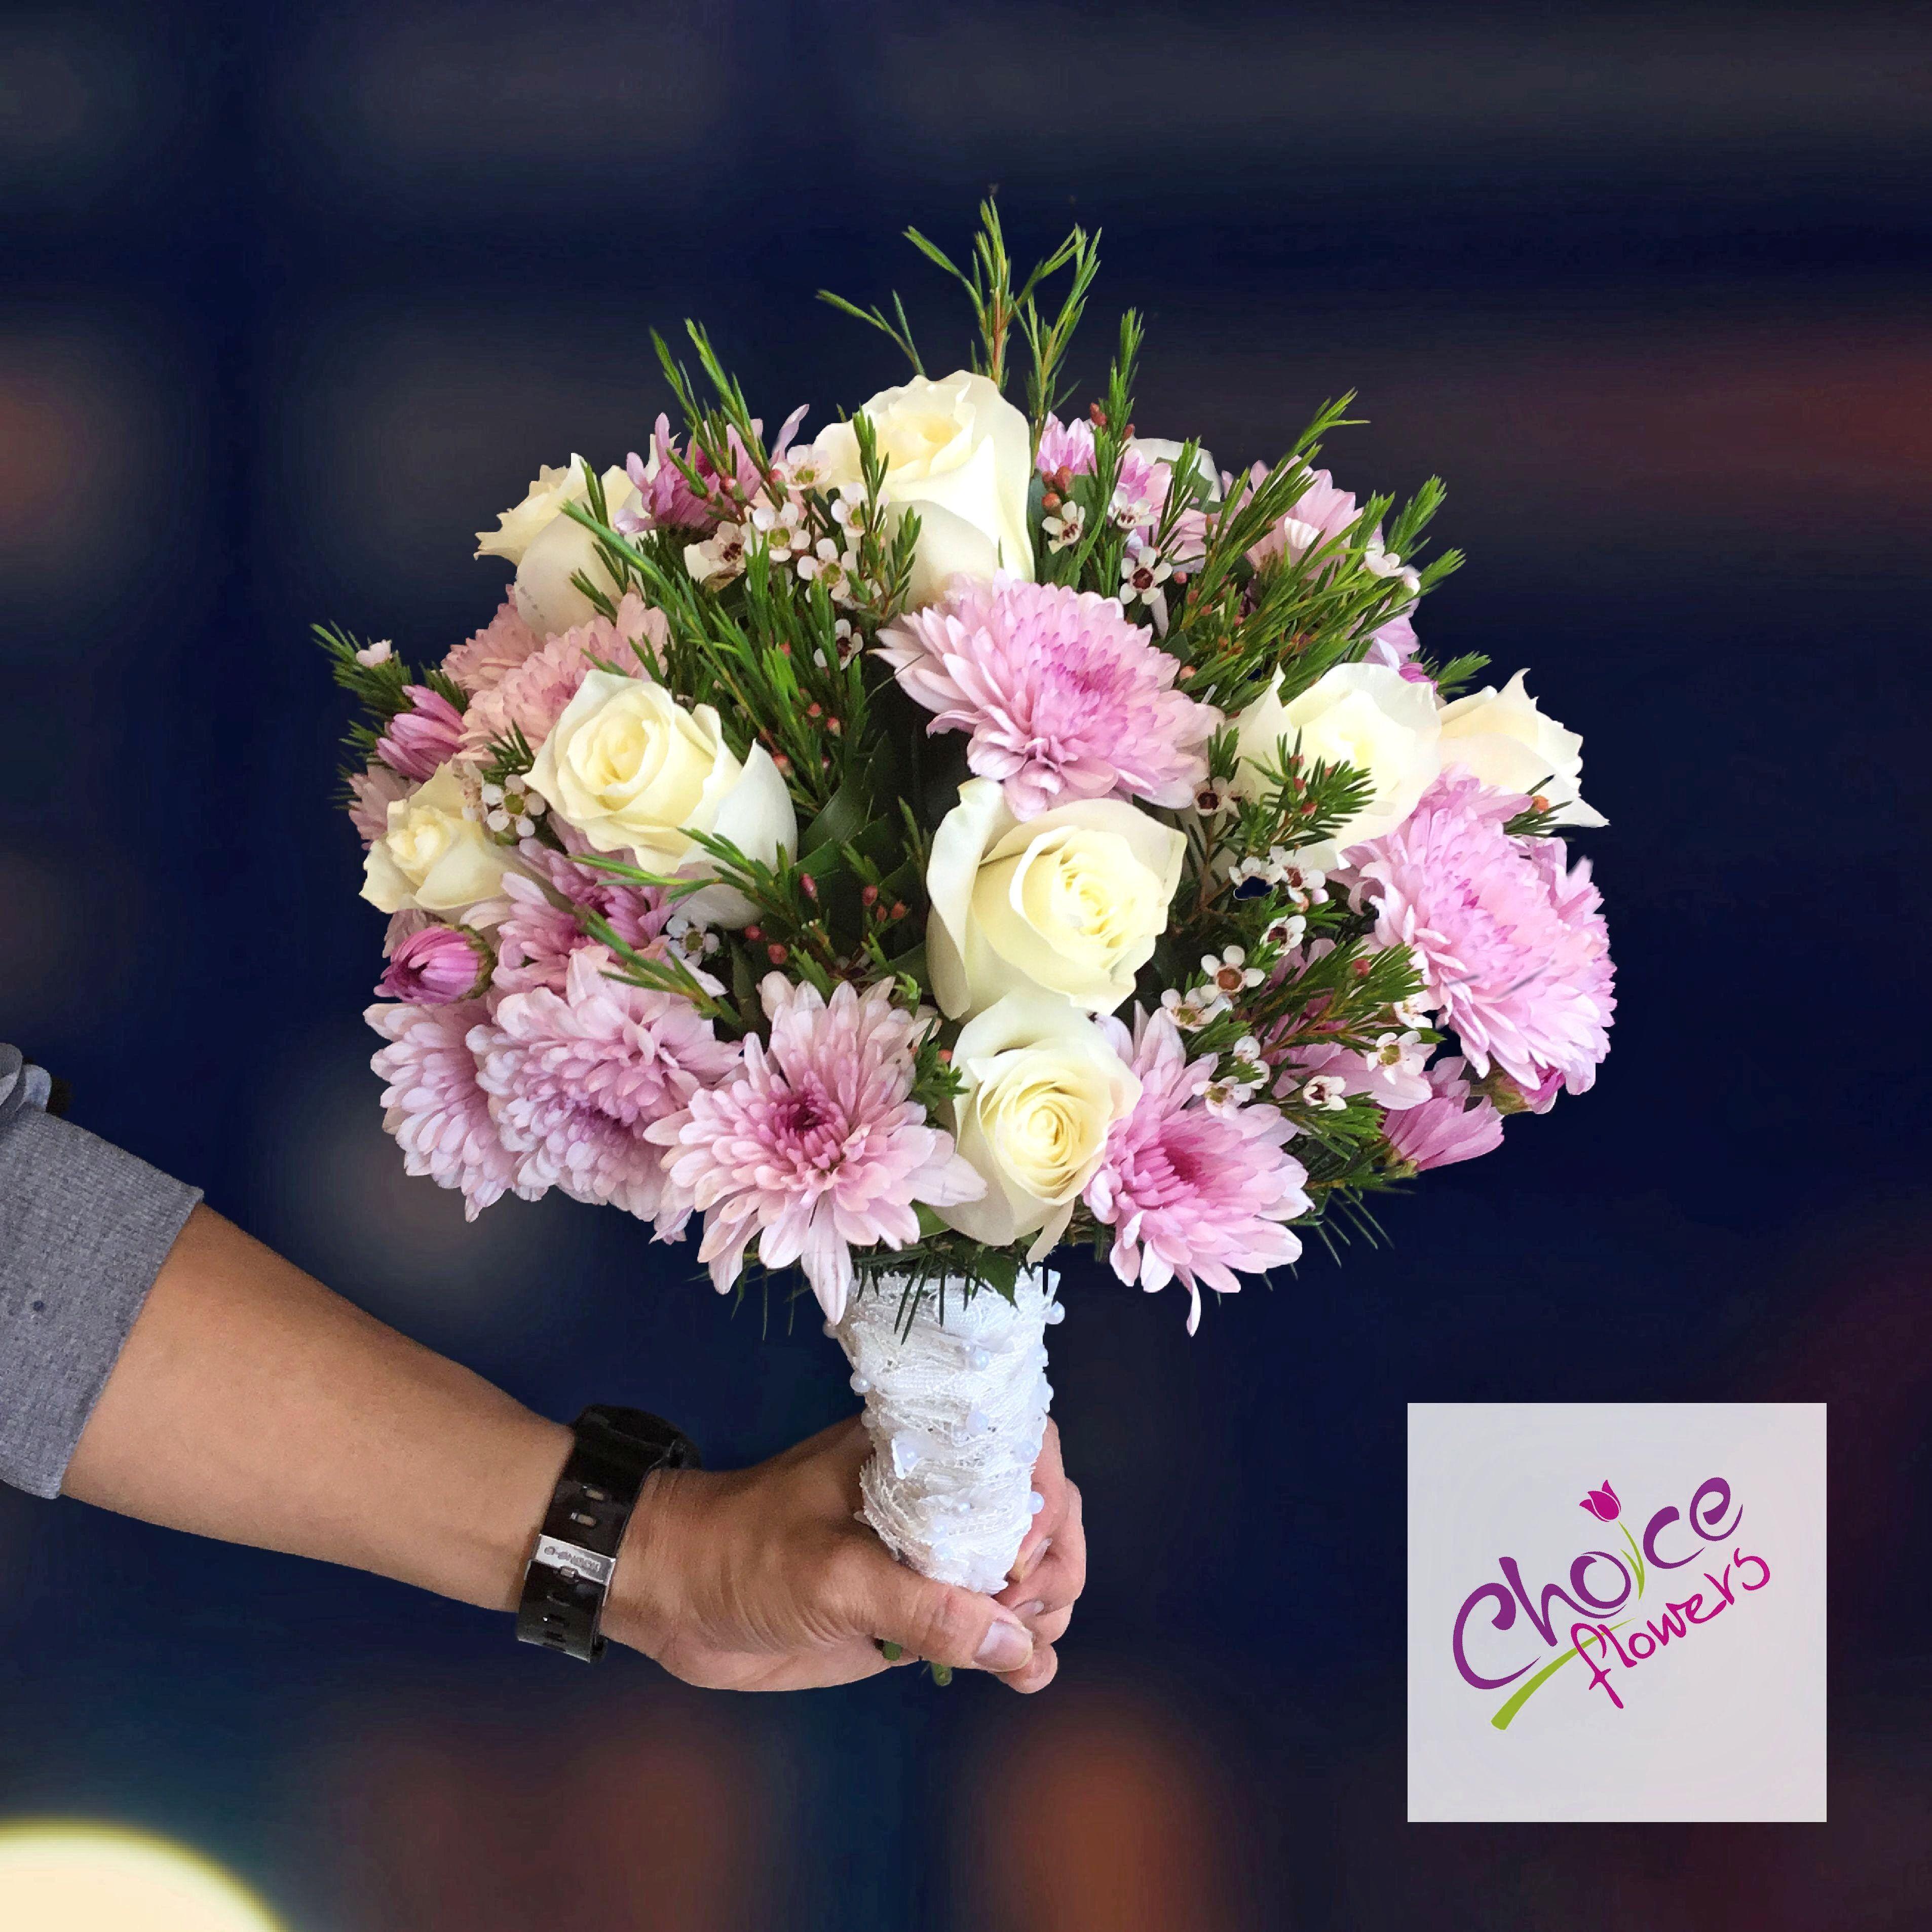 Royal Beauty Flowers Whiteroses Pinkflowers Roselovers Beautifull Floralperfection Flowerarr Flower Delivery Flower Shop